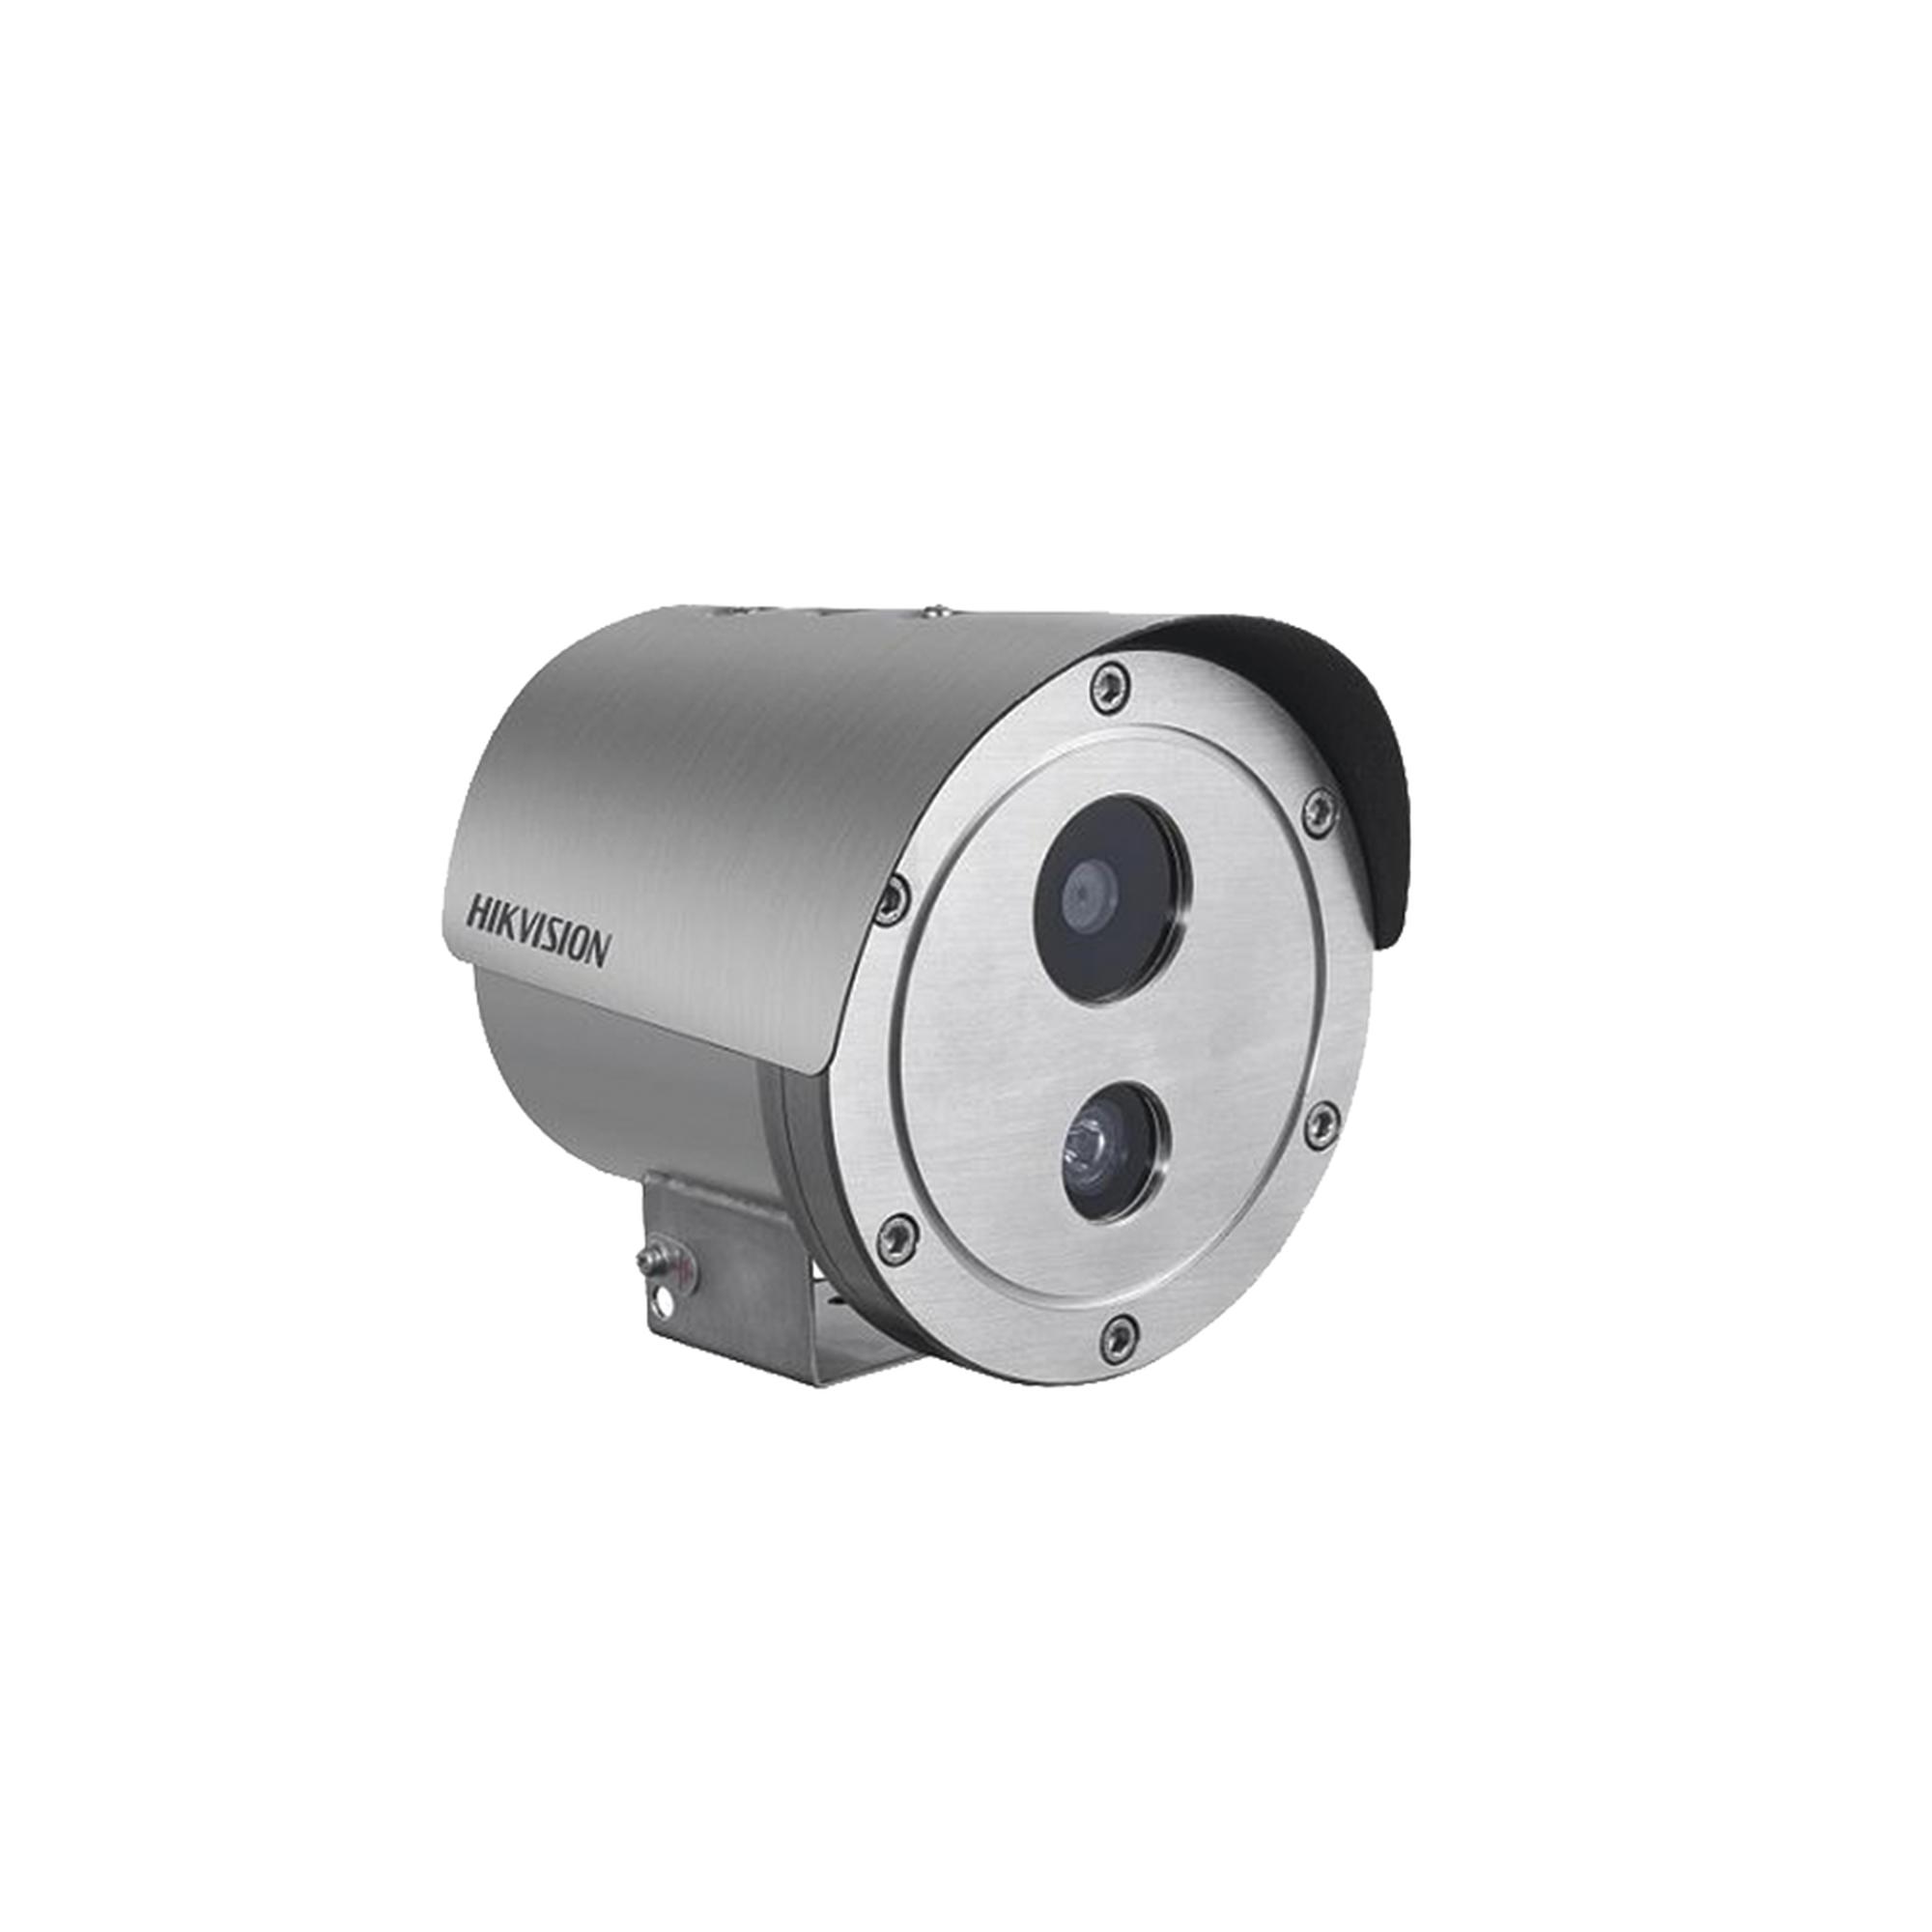 Bala IP 4 Megapixel / Antiexplosion / H.265+ / 30 mts IR / WDR 120 dB / PoE / IP68 / Entrada-Salida audio y alarma / MicroSD